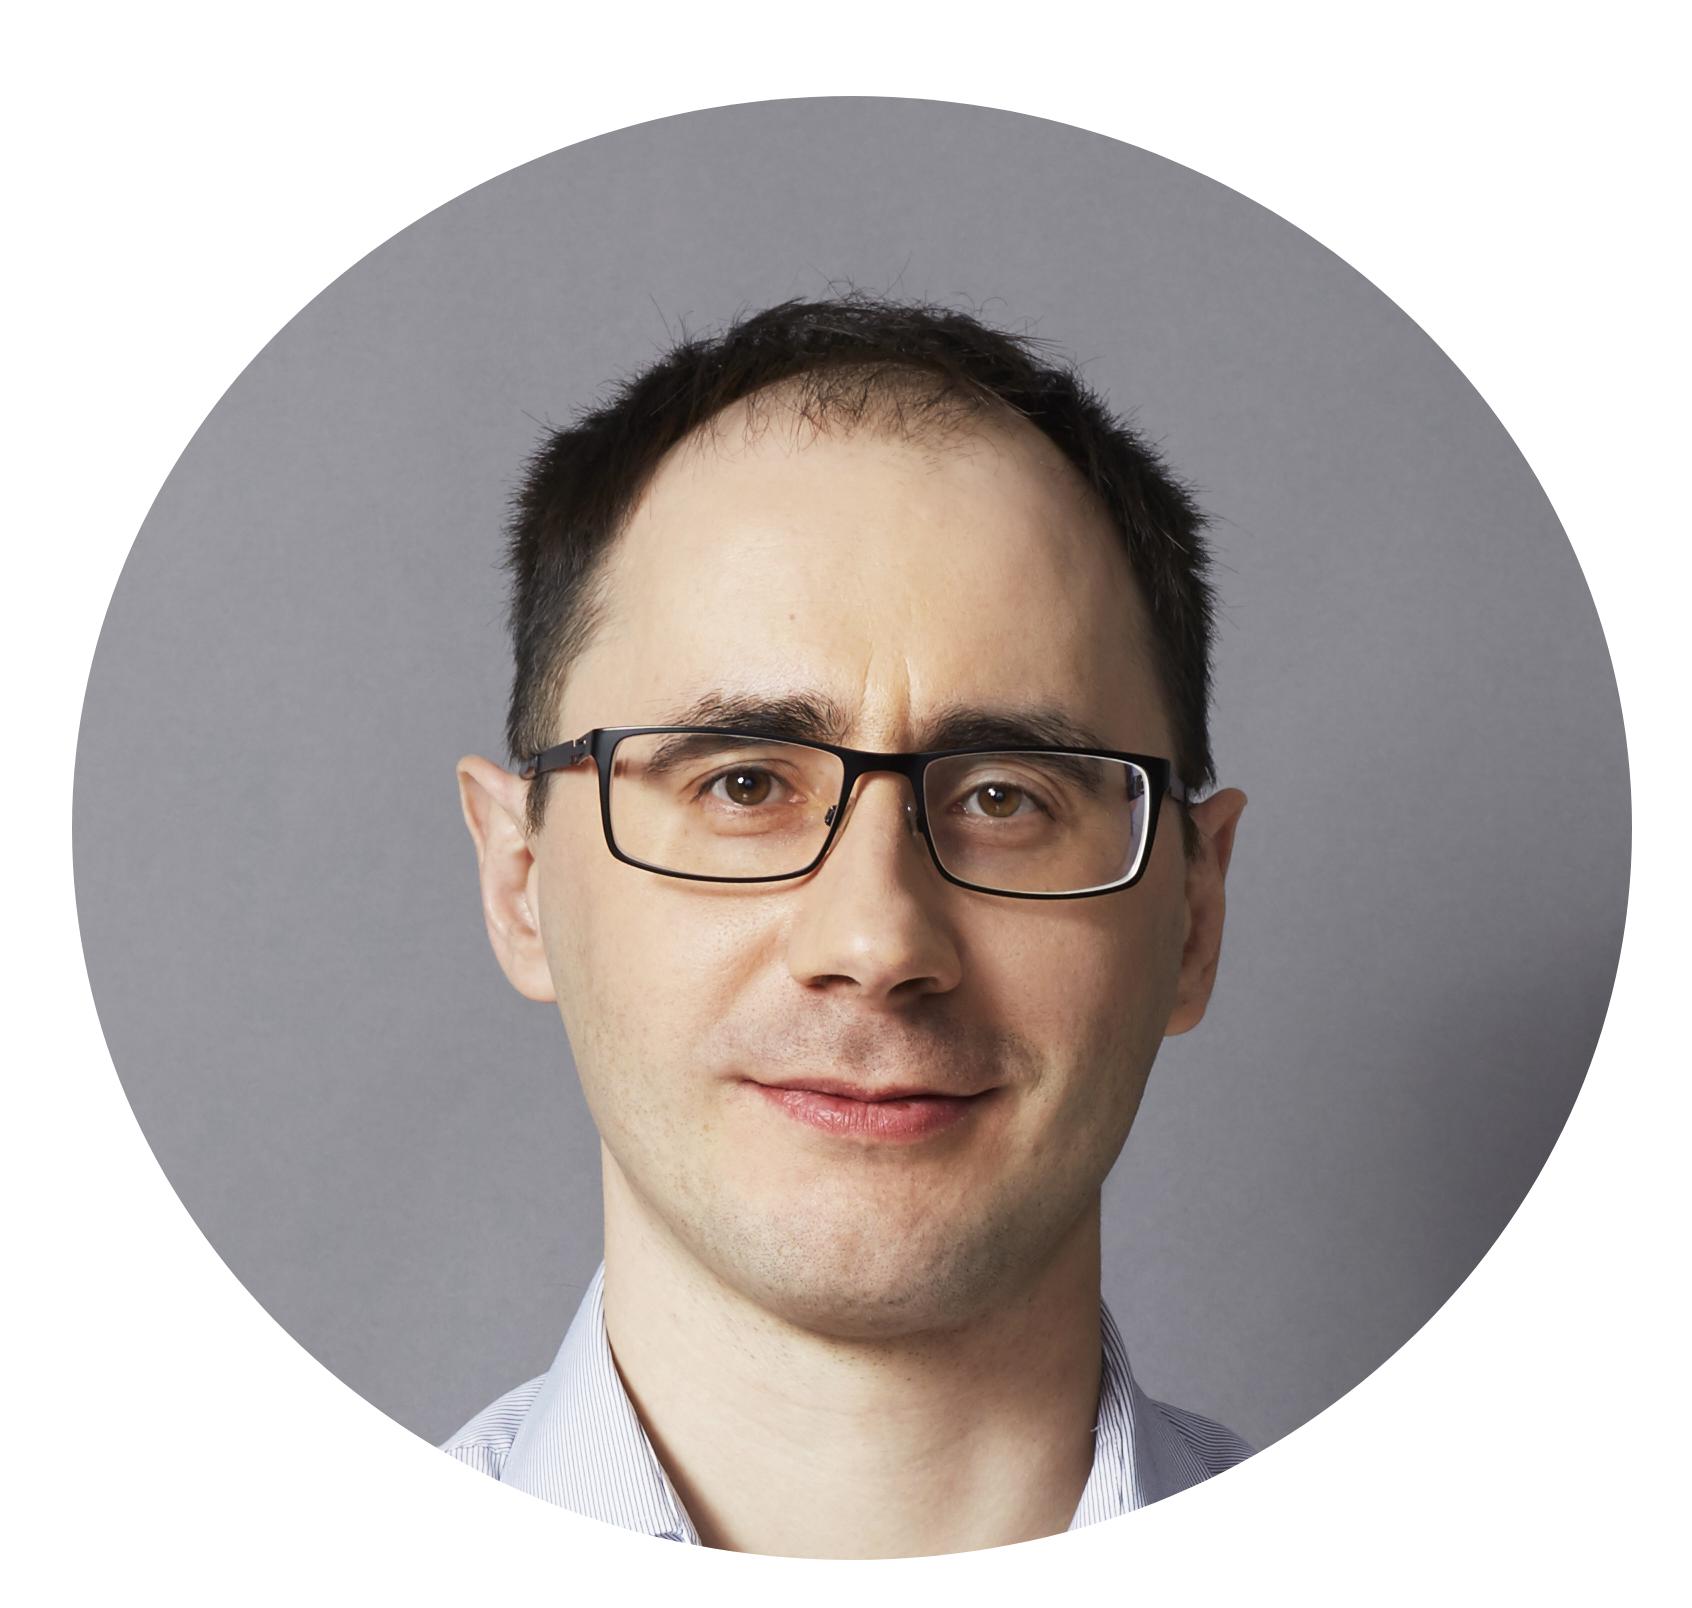 Александр Емешев